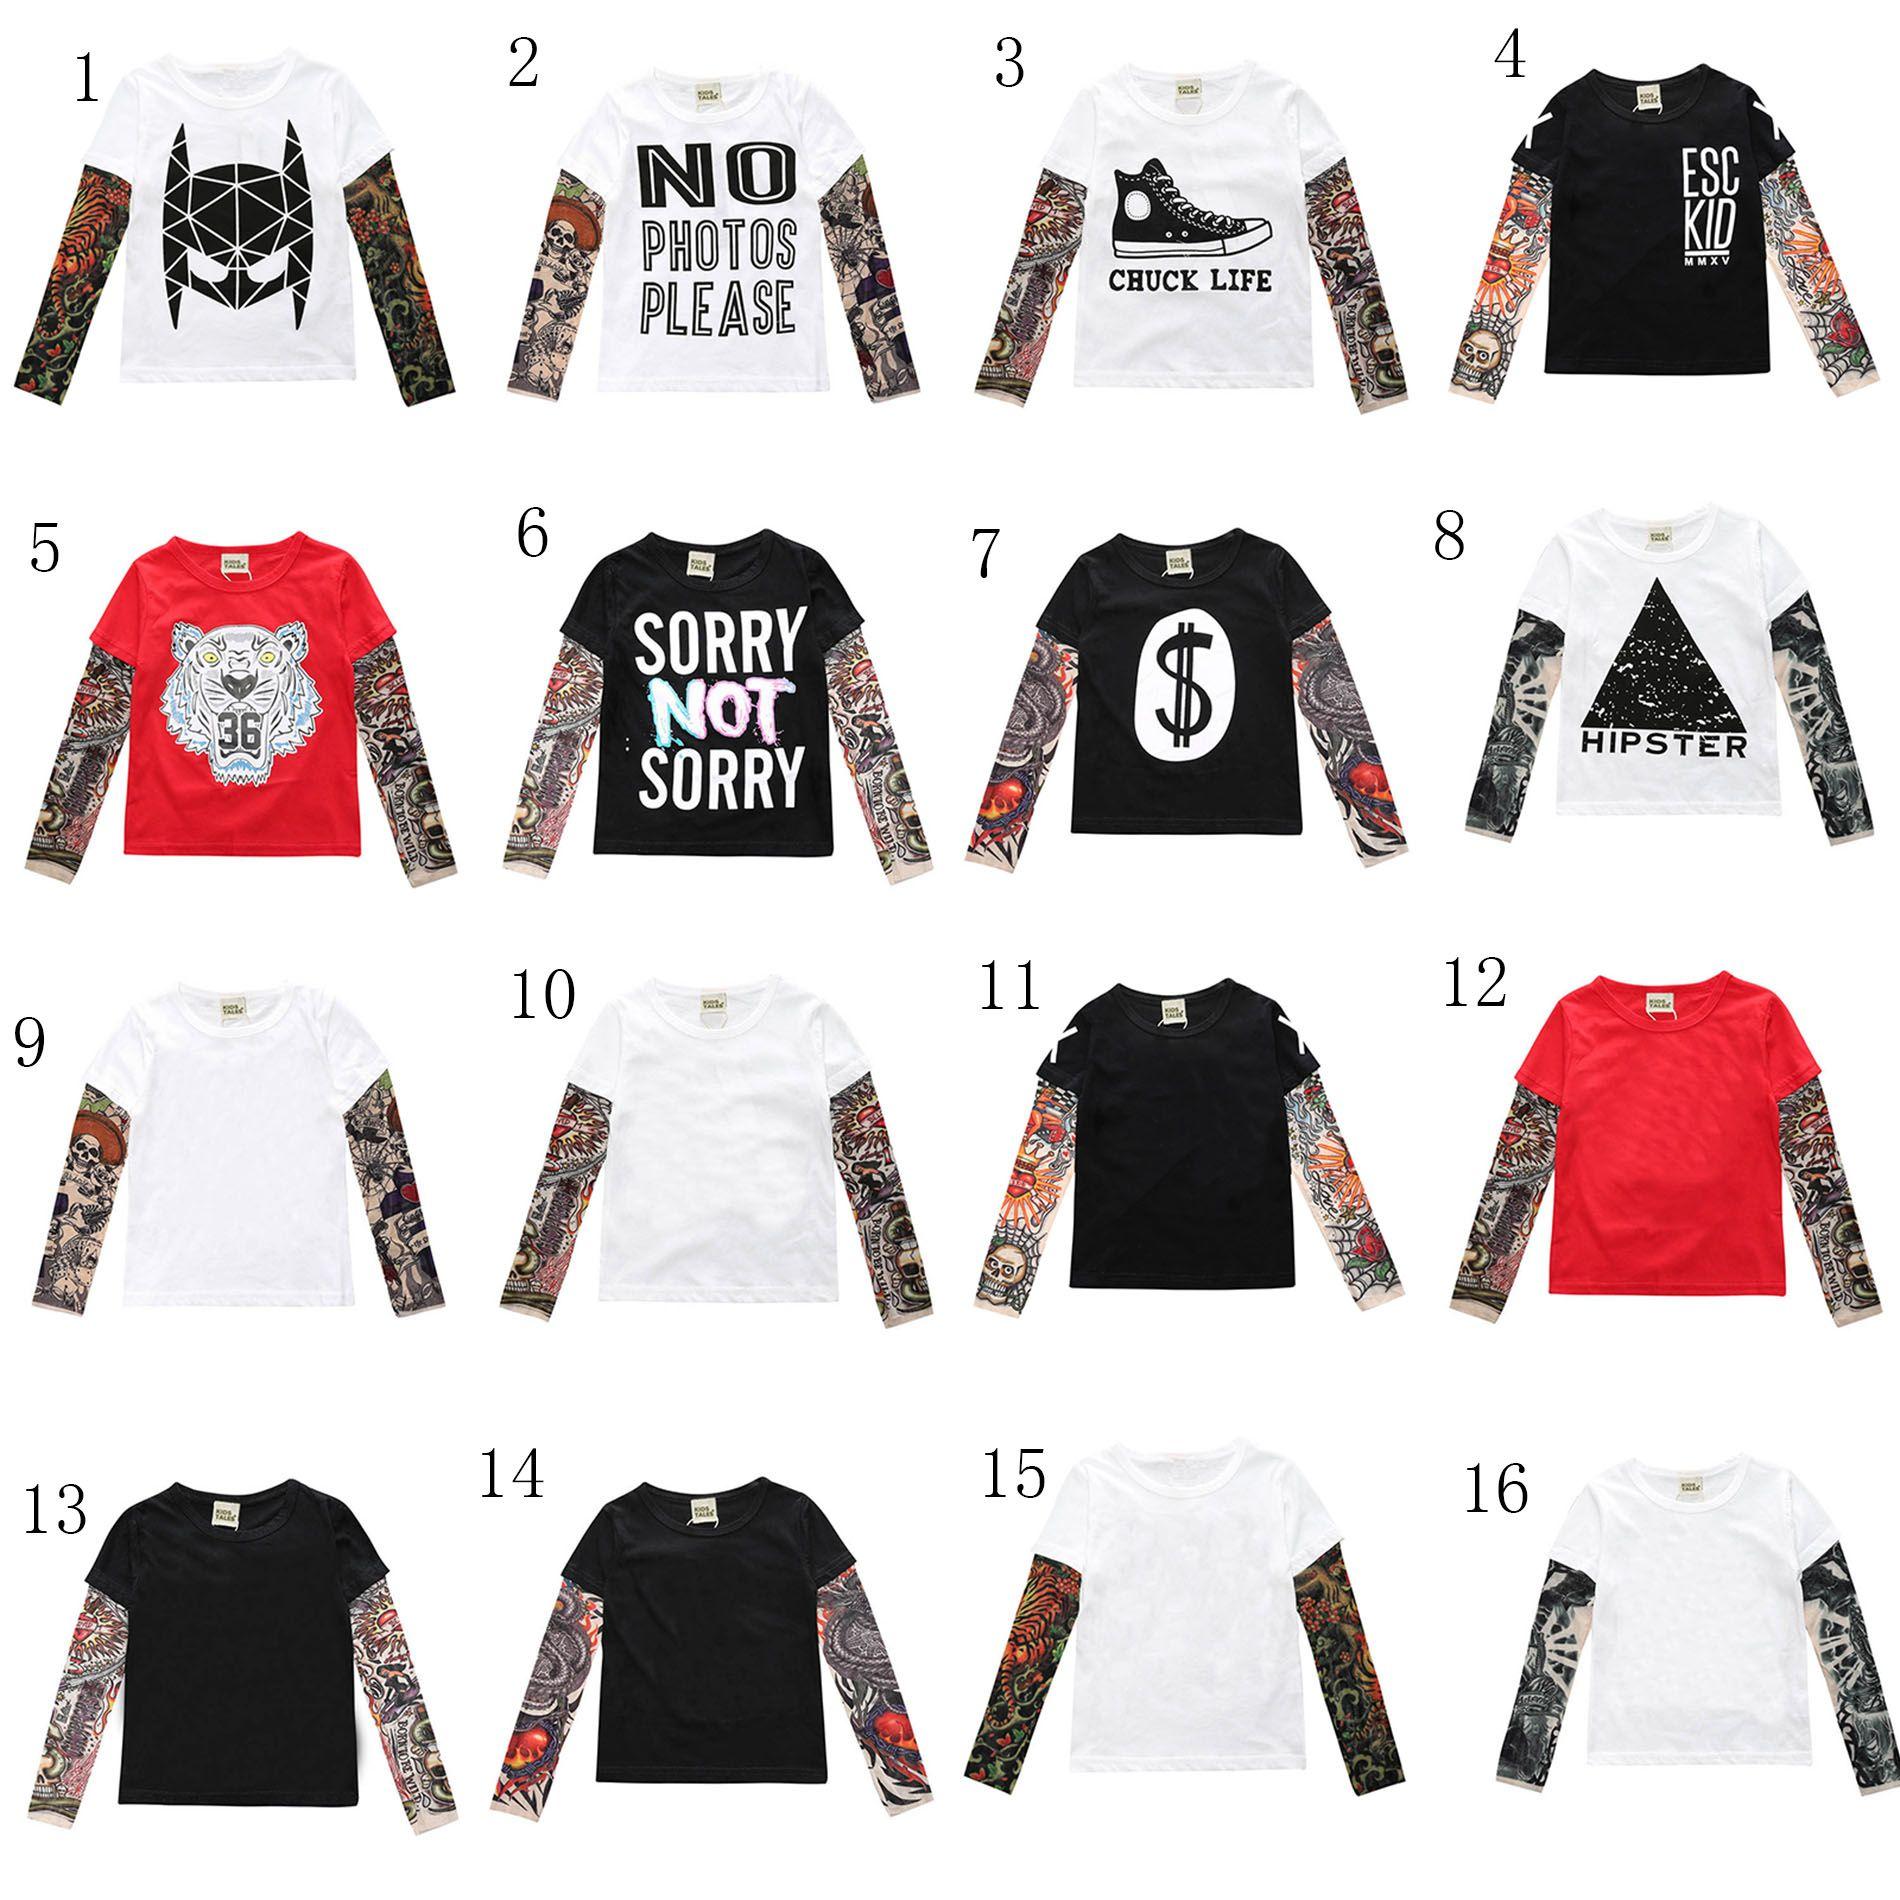 Neue baby INS druck T-shirts baumwolle Kinder Hip hop Tattoo Lange Ärmel Tops Tees Kinder Shirts 16 Farben C2303